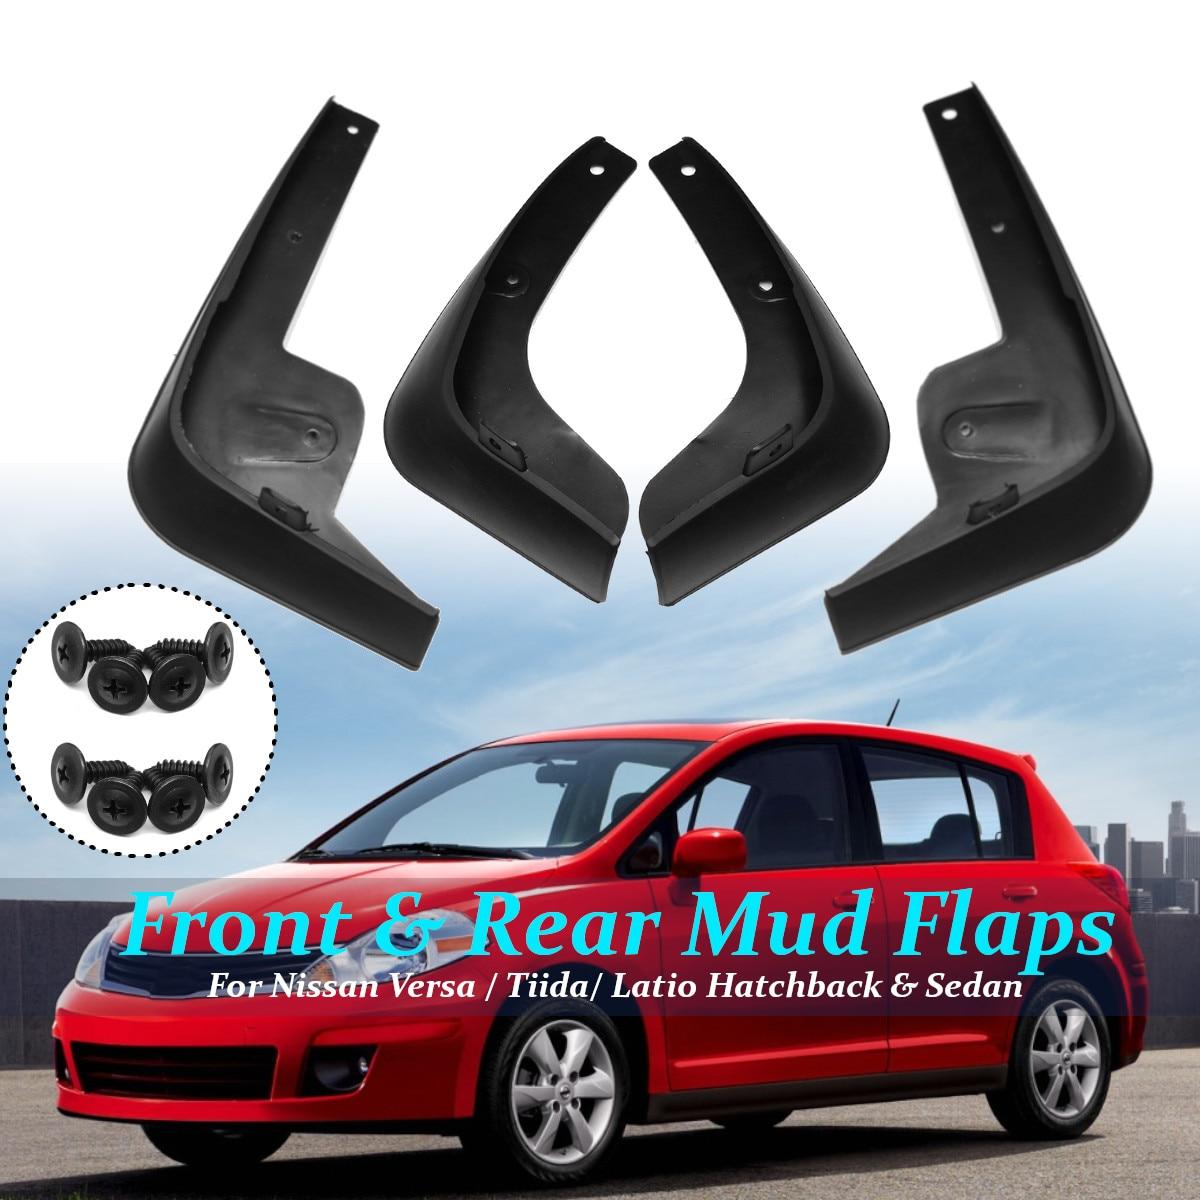 Front Rear Mud Flaps For Nissan Tiida Versa C11 2007-2011 Hatchback Fender Splash Guard Mud Flap Car Accessories